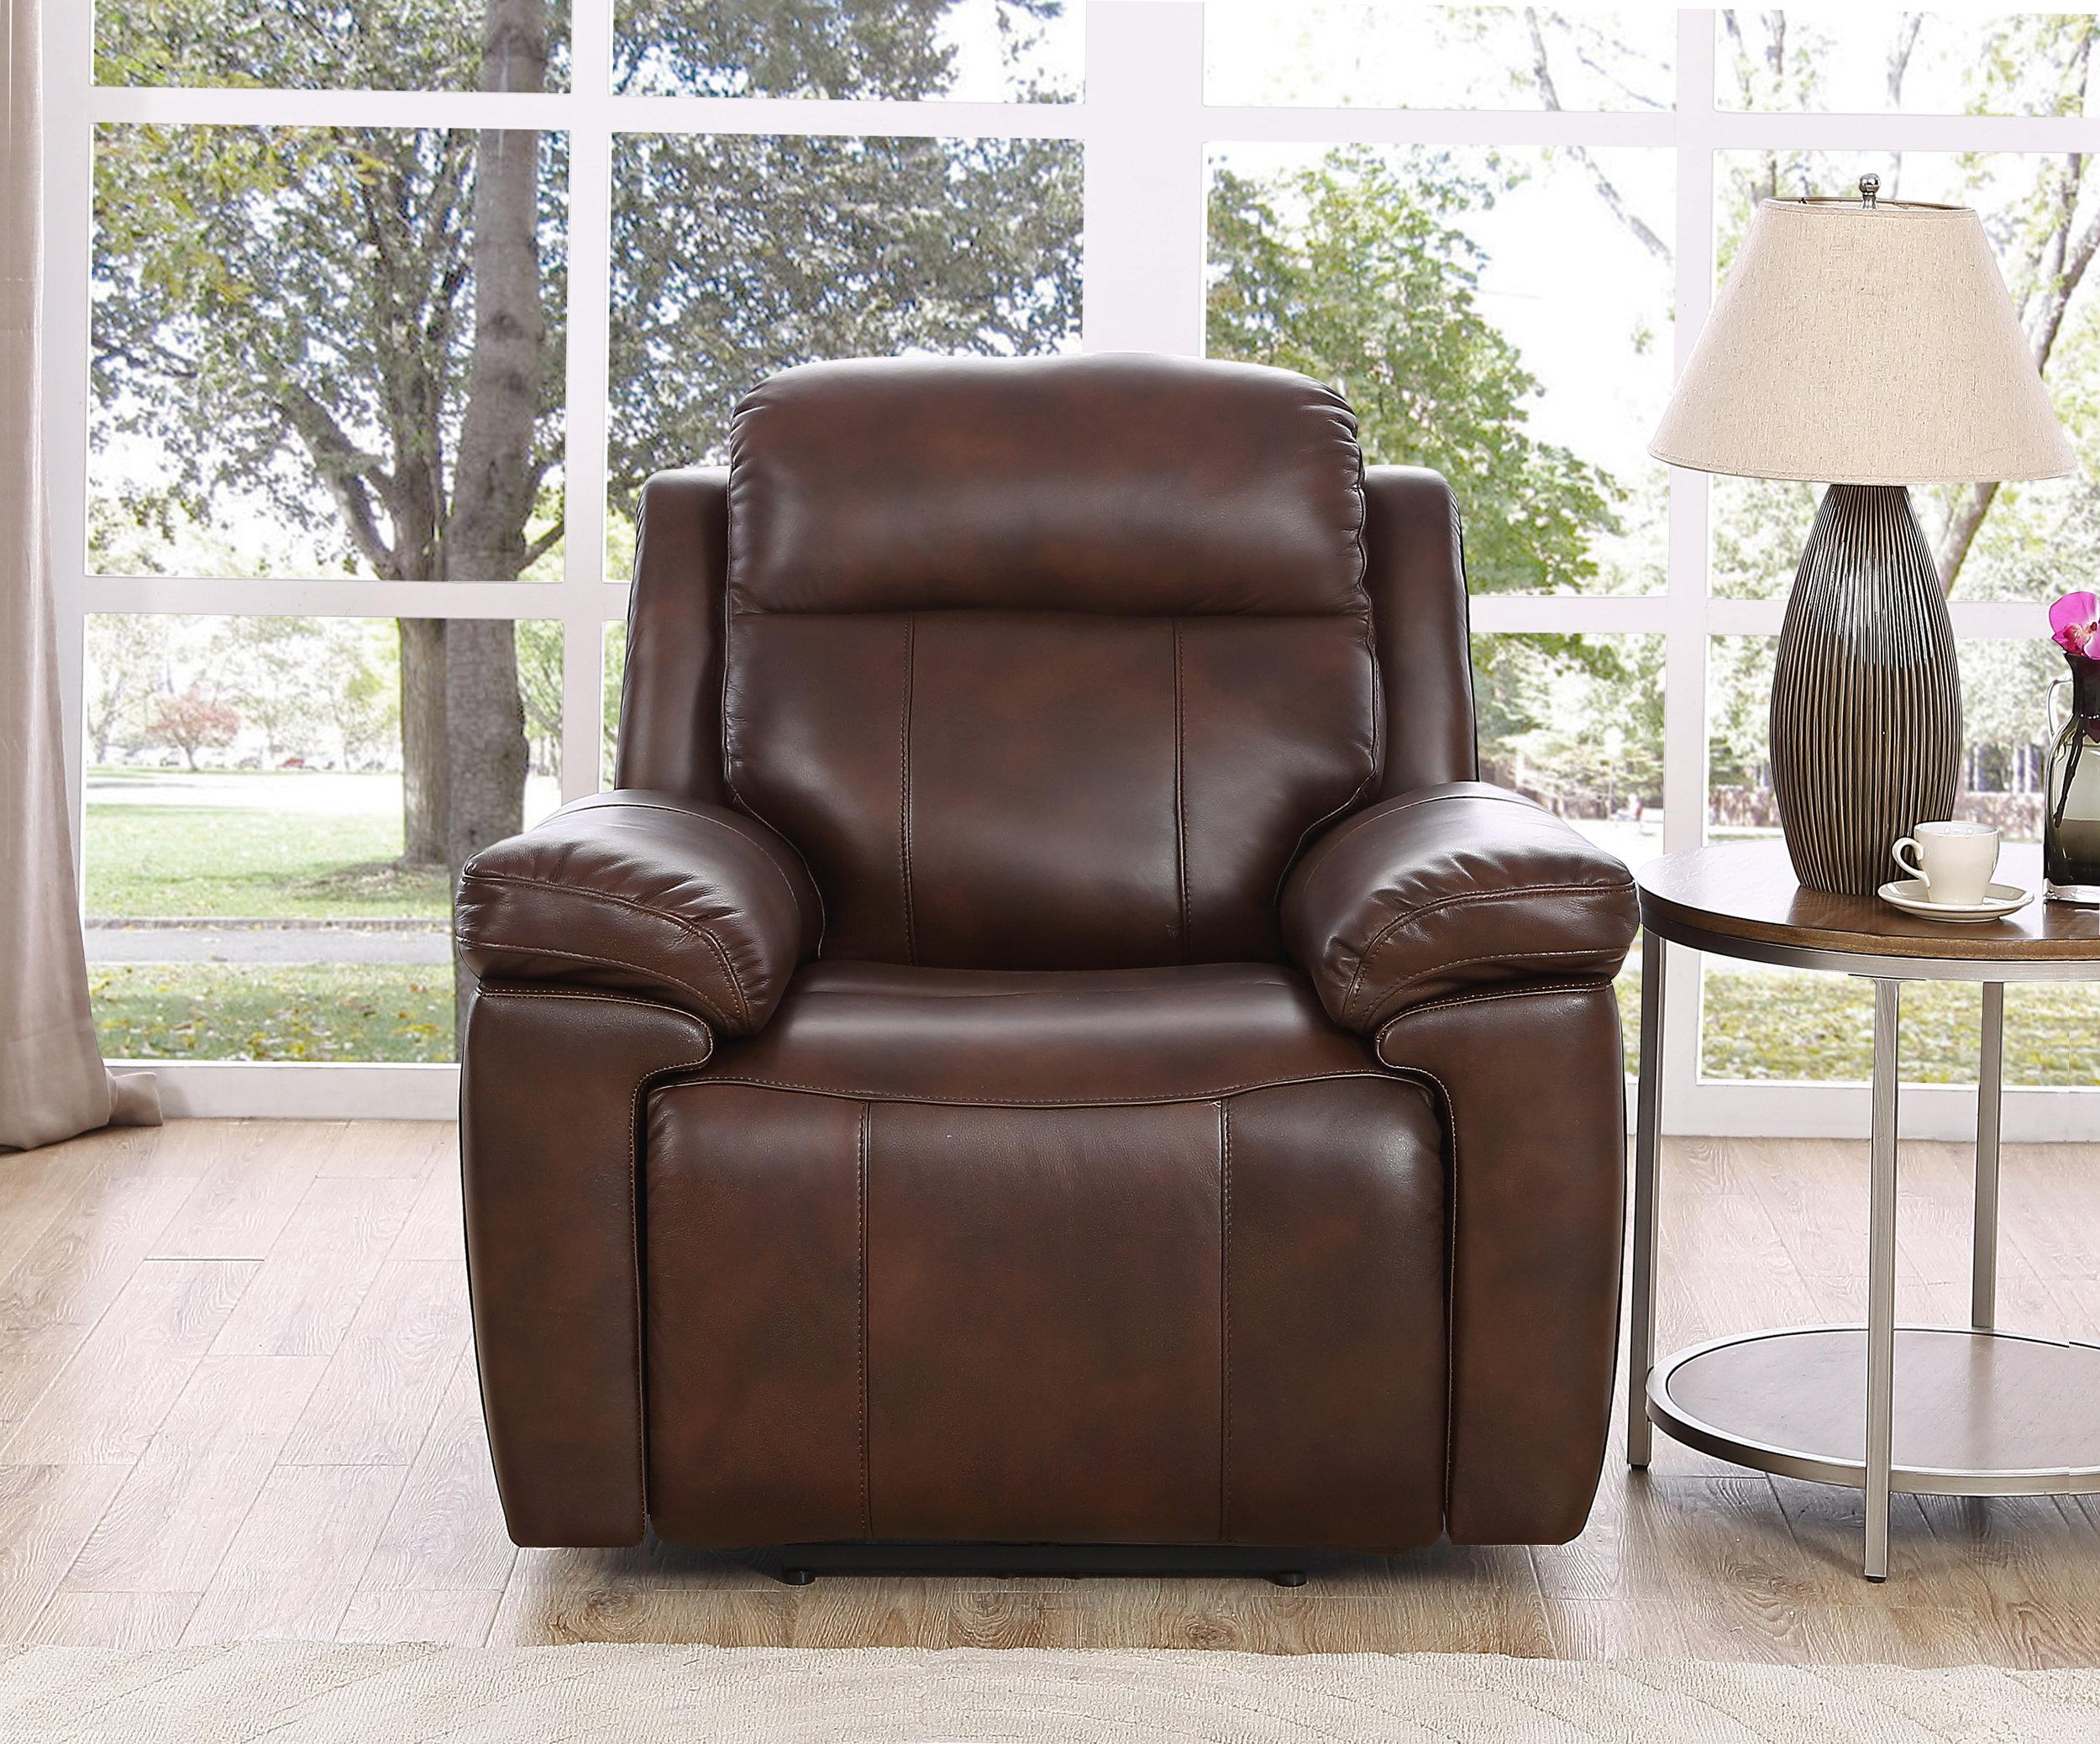 The Montana Chair